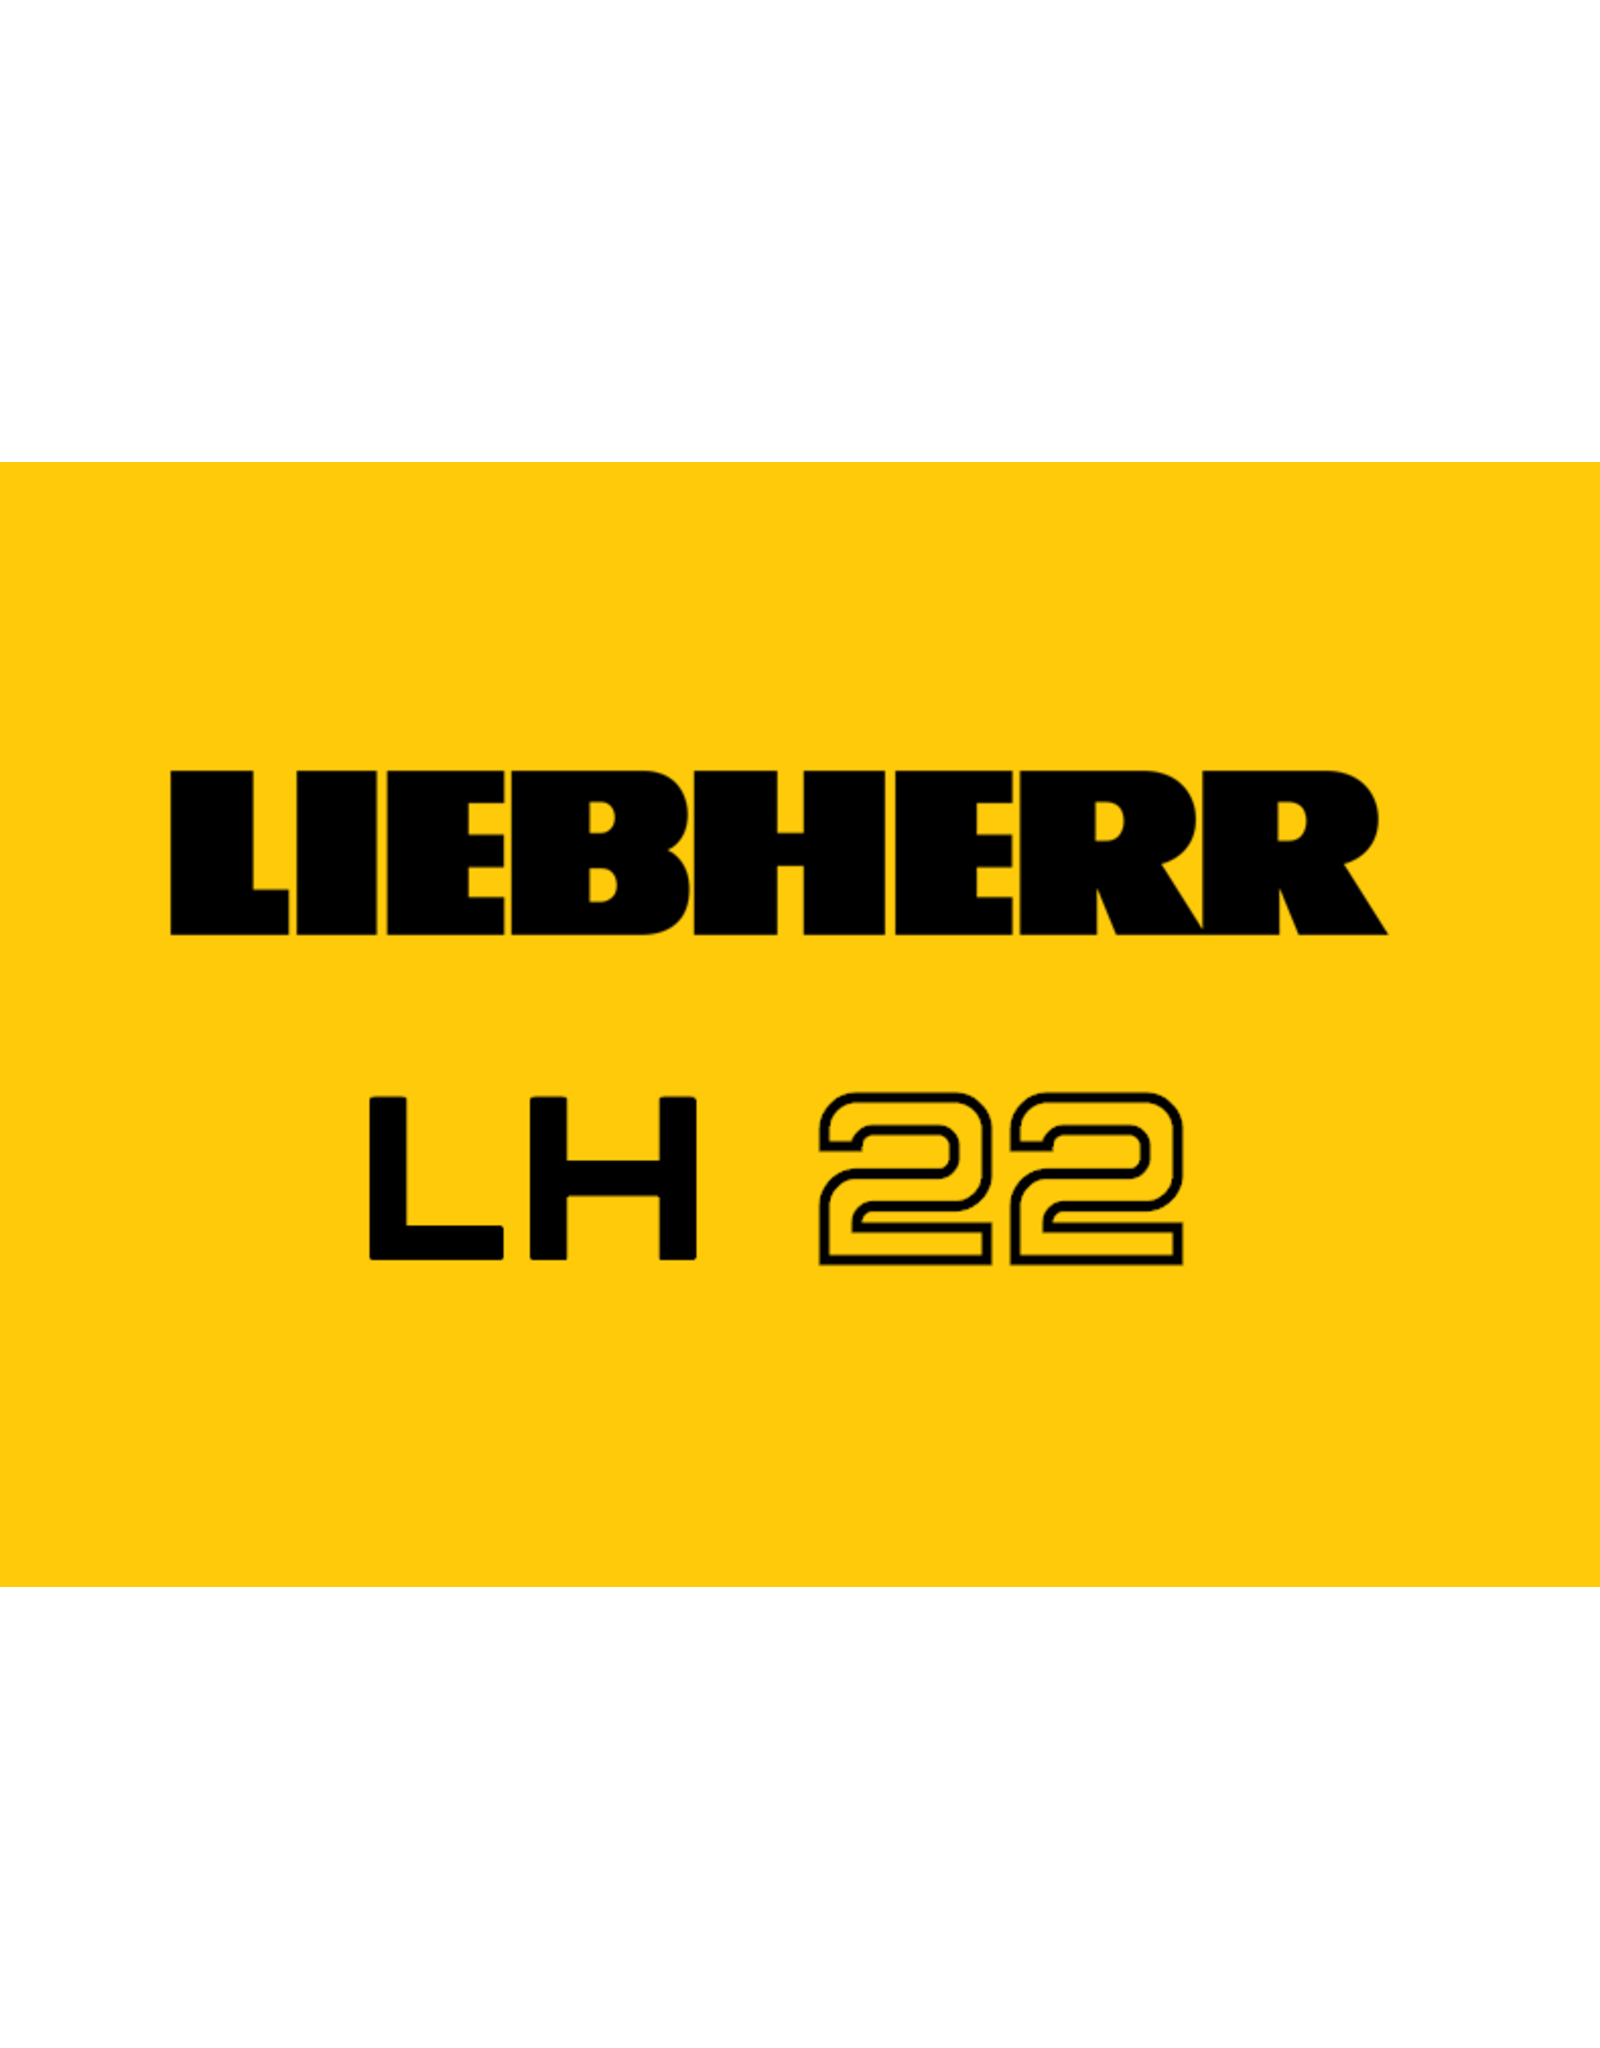 Echle Hartstahl GmbH FOPS pour Liebherr LH 22